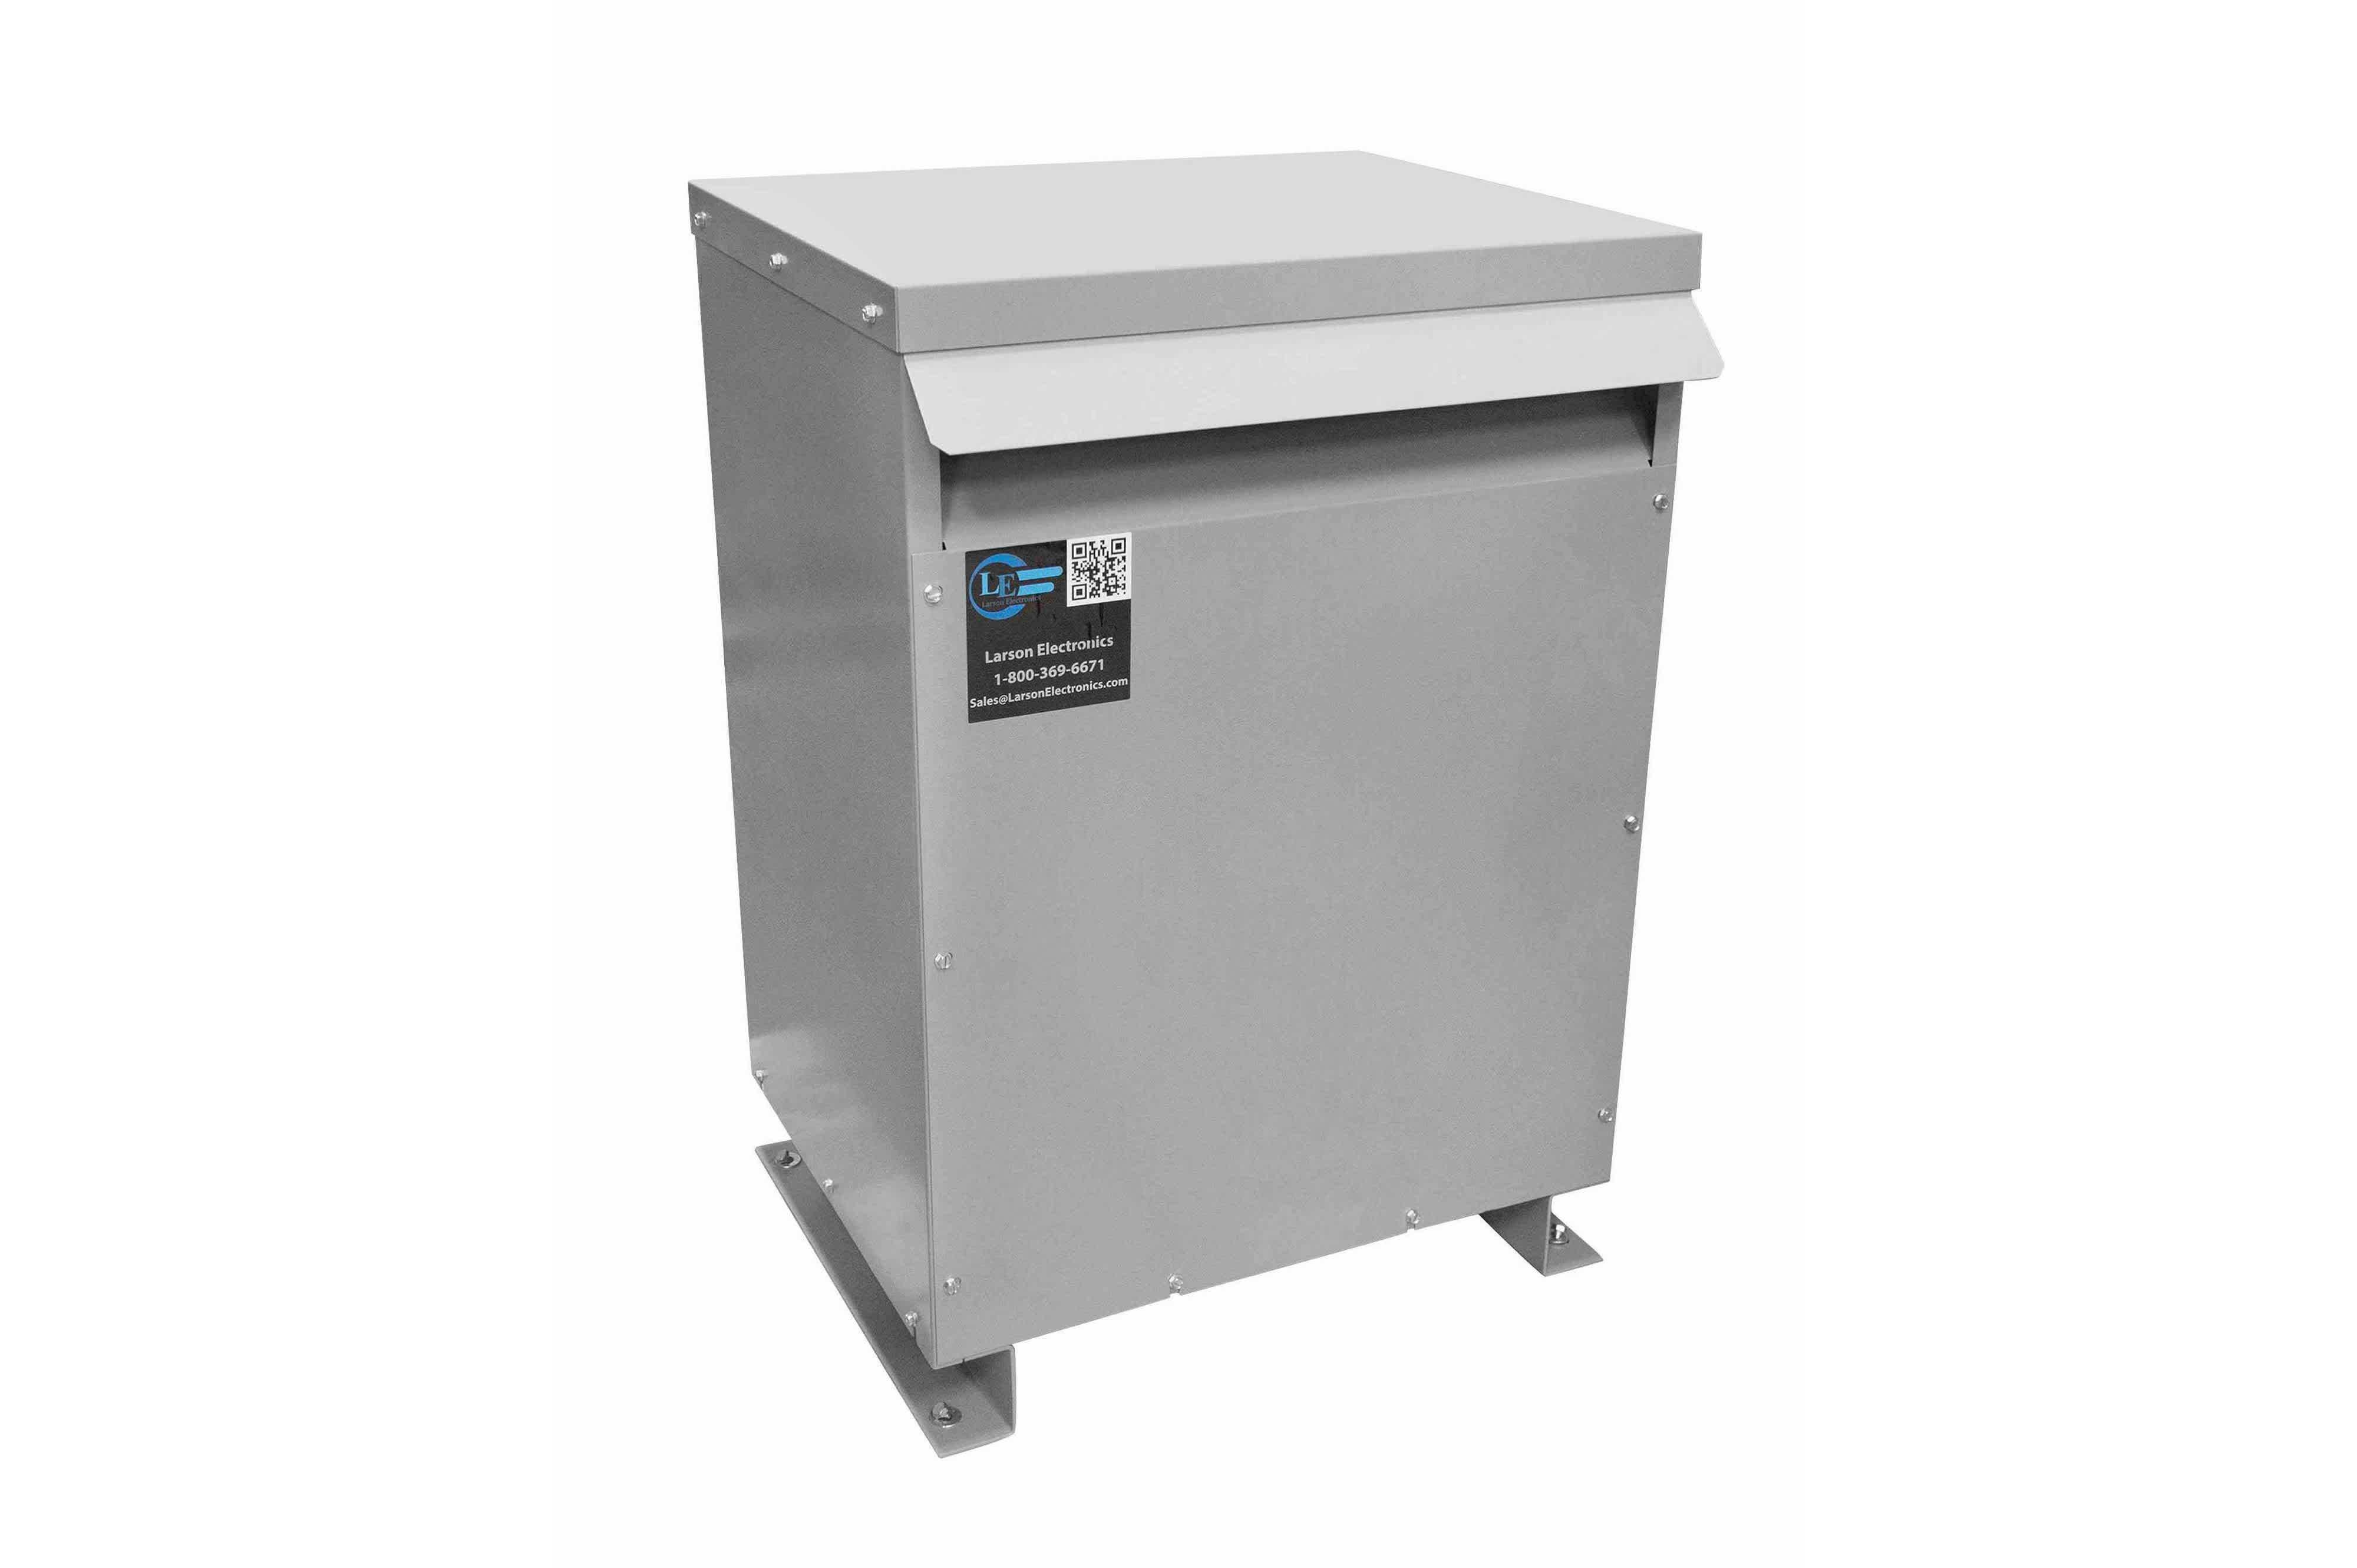 30 kVA 3PH Isolation Transformer, 208V Wye Primary, 380Y/220 Wye-N Secondary, N3R, Ventilated, 60 Hz